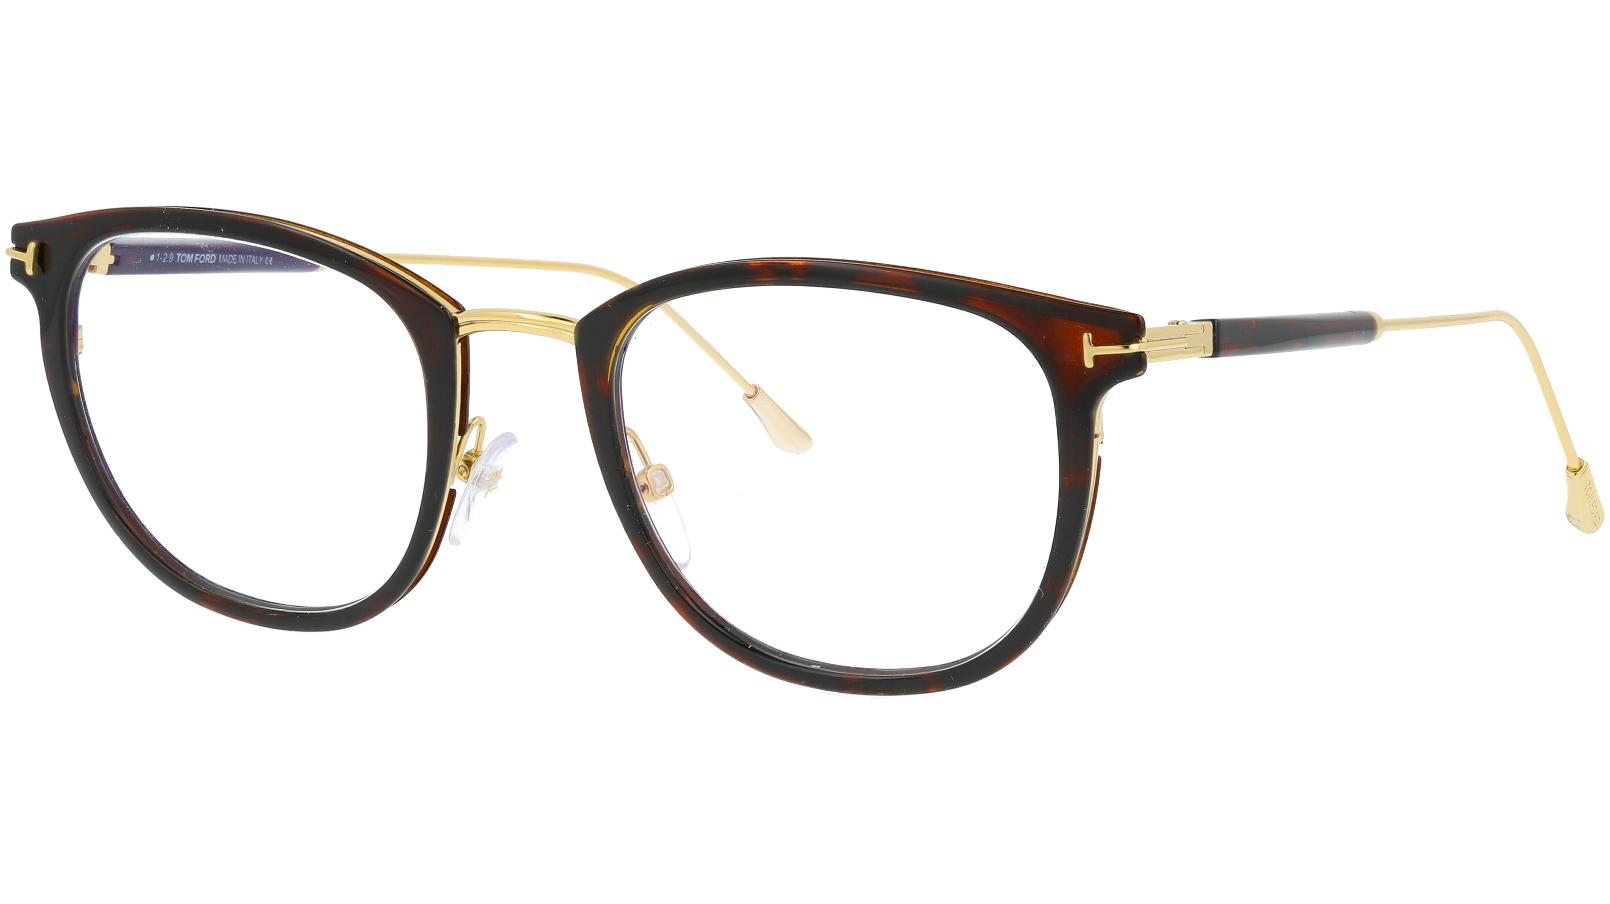 Tom Ford TF5612-B 052 51 Black Titanium Glasses